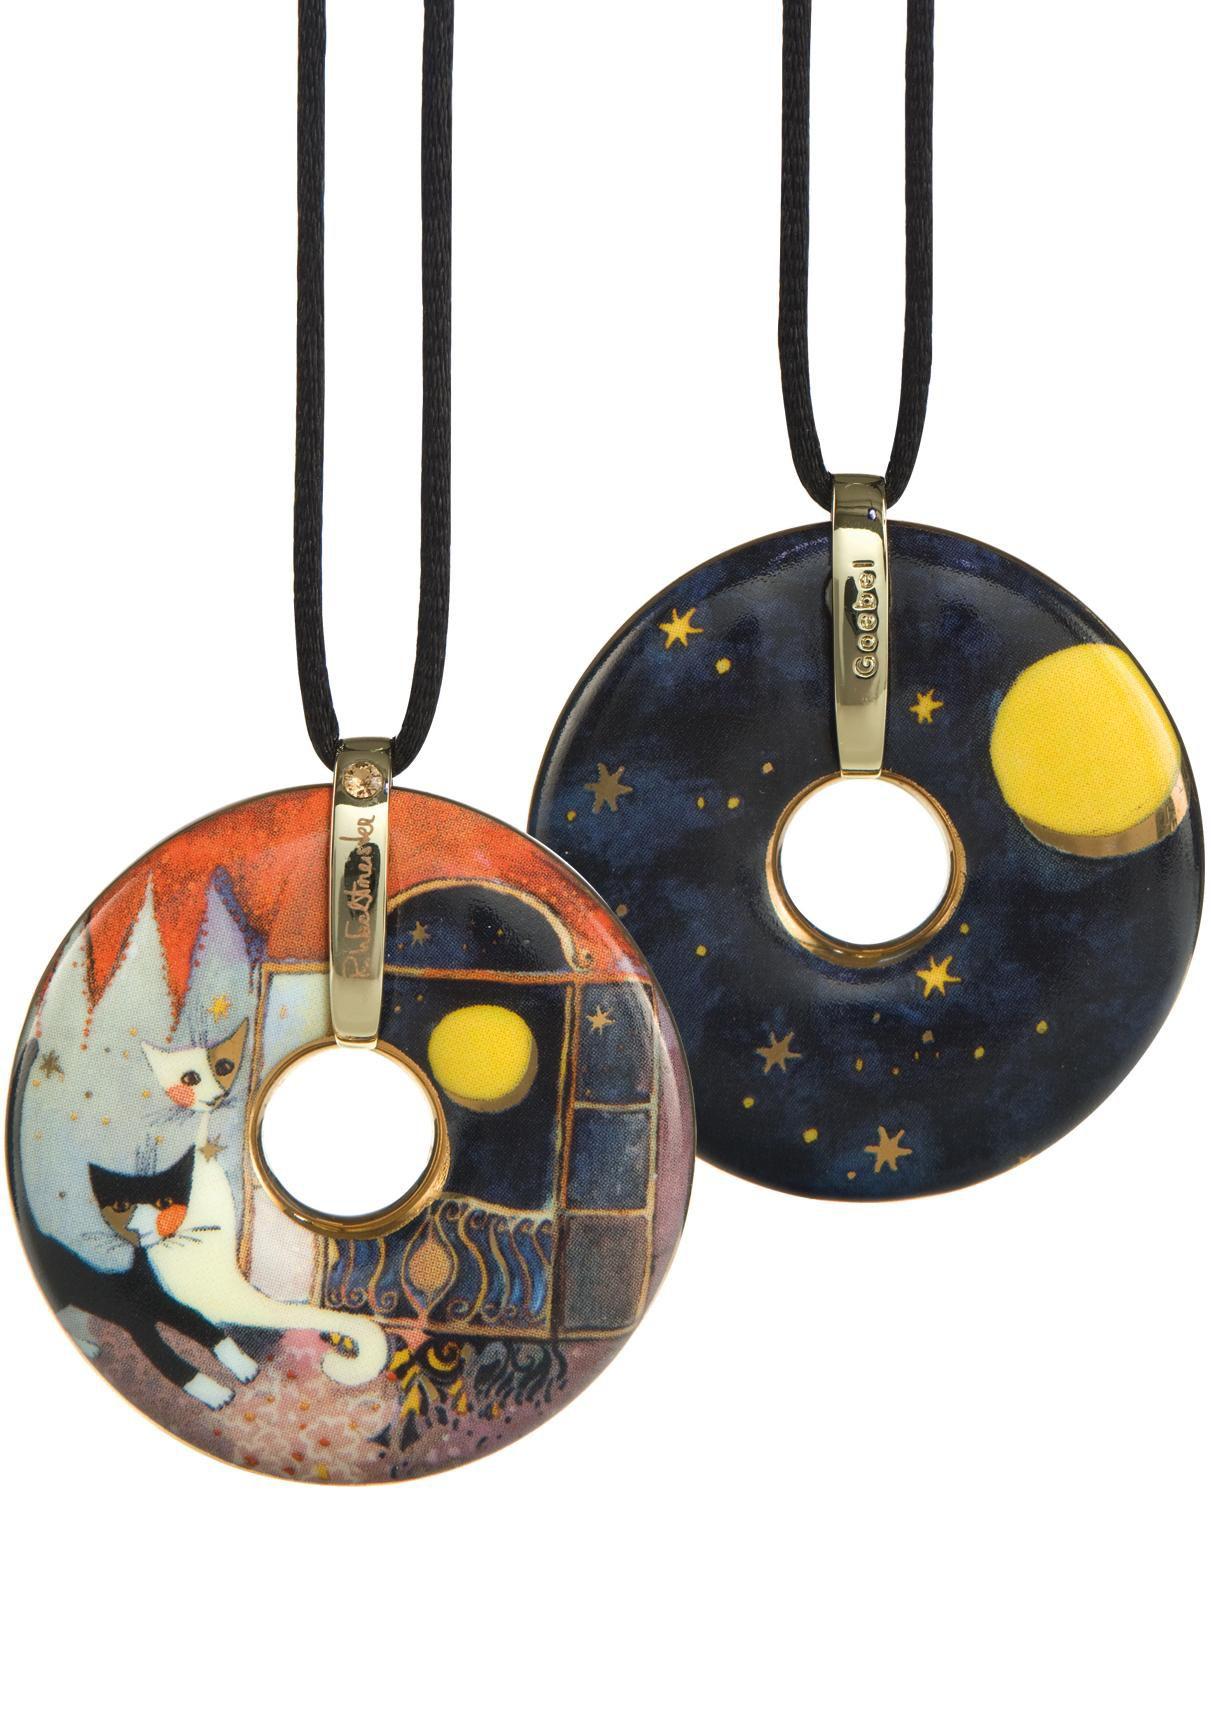 GOEBEL Goebel Kette mit Anhänger »Amici della luna, 66851471«